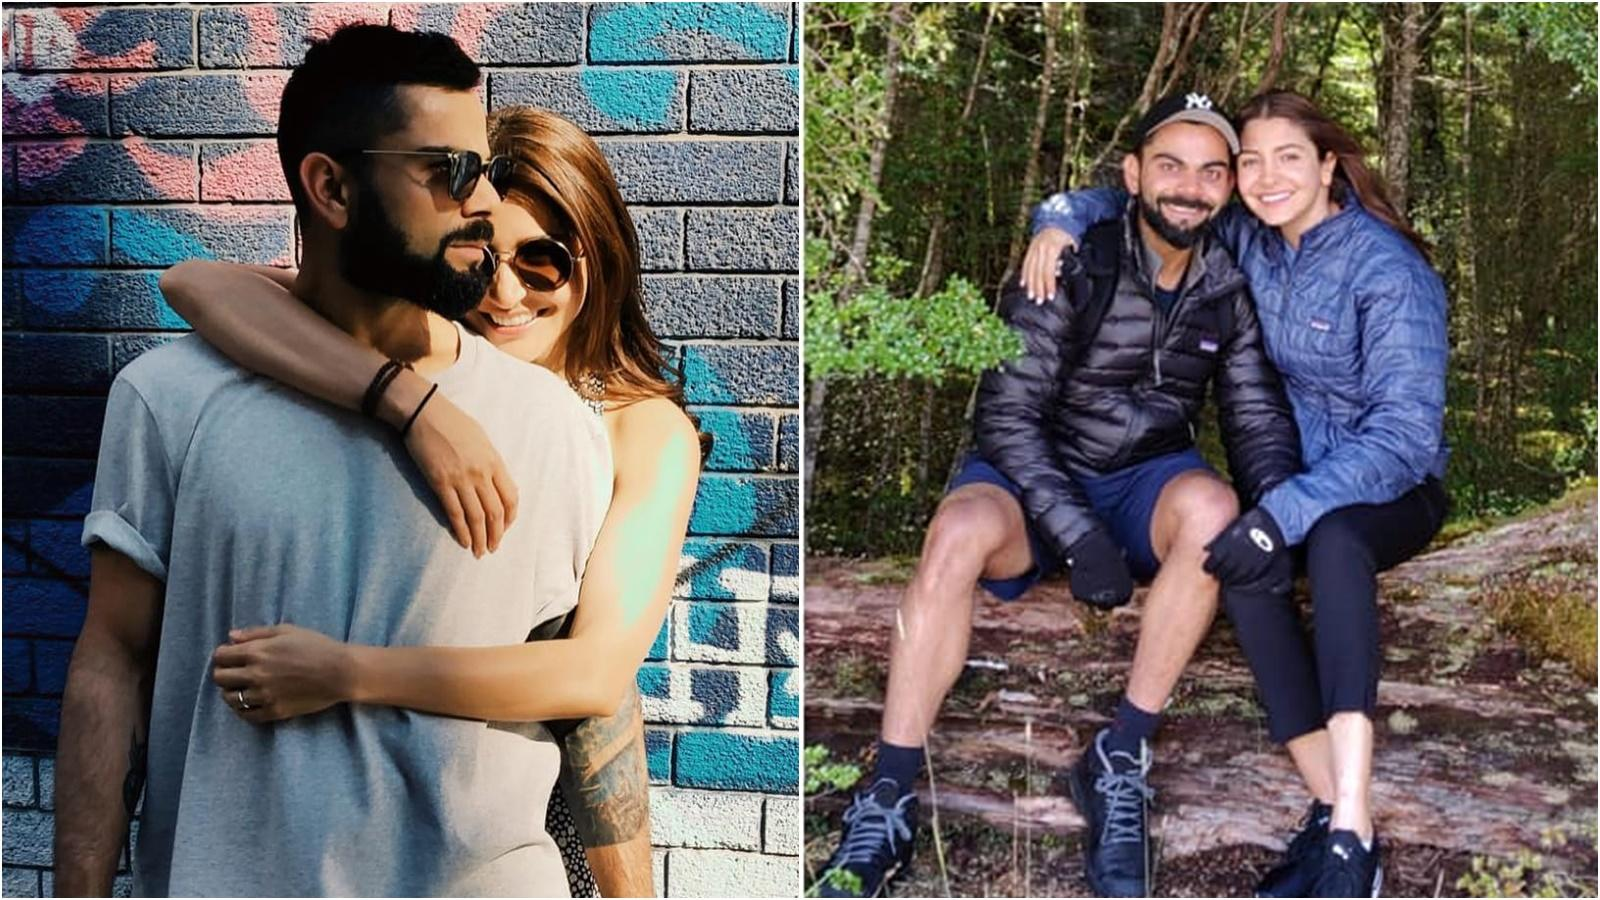 Anushka Sharma and Virat Kohli's vacation pictures giving major travel goals!